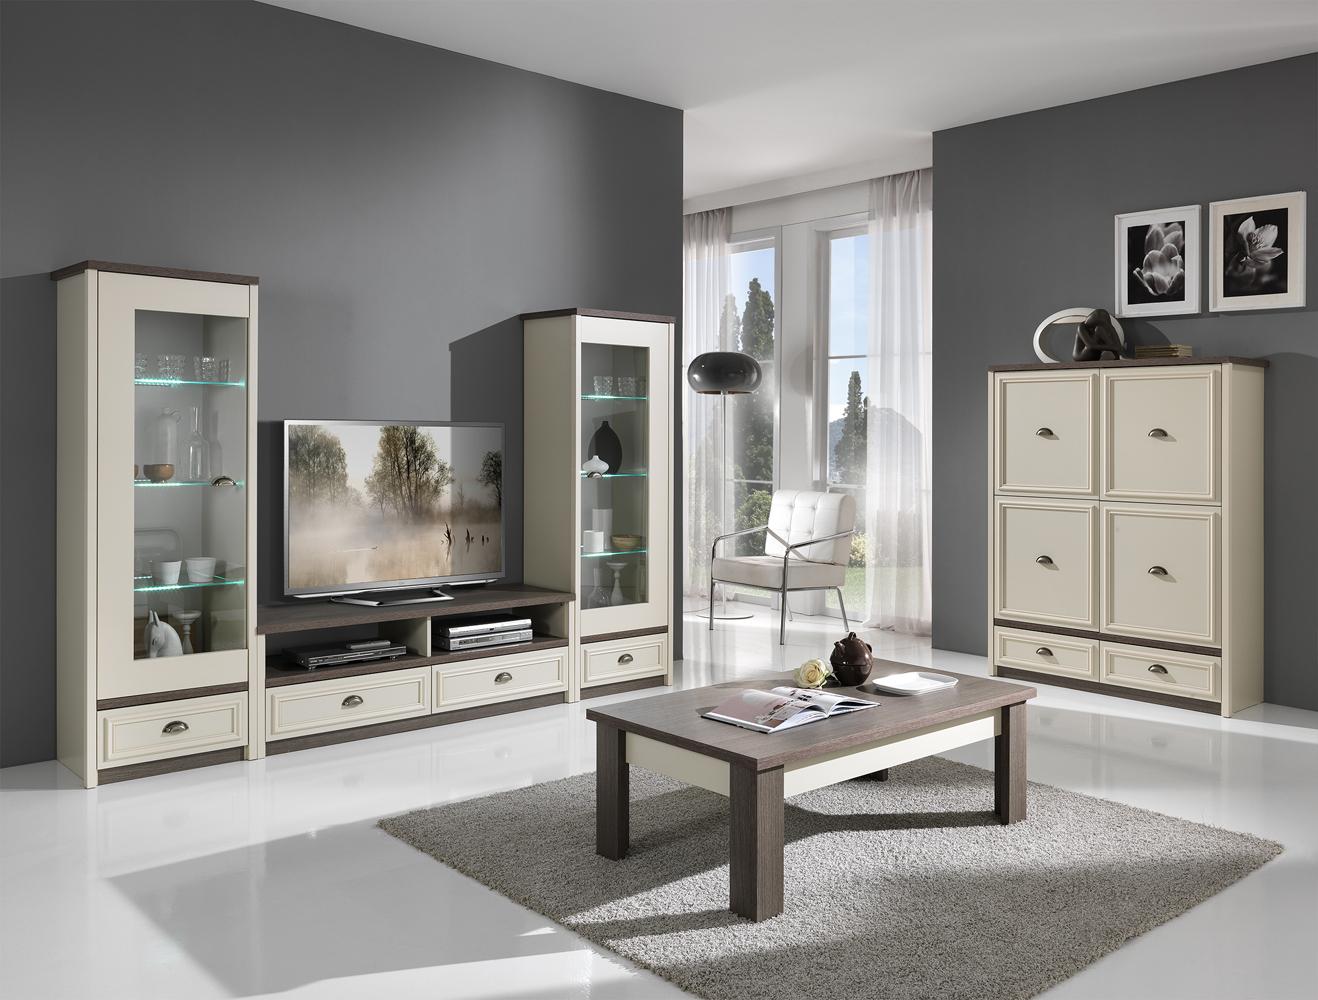 meuble tv country nkl meuble wassa et deco. Black Bedroom Furniture Sets. Home Design Ideas